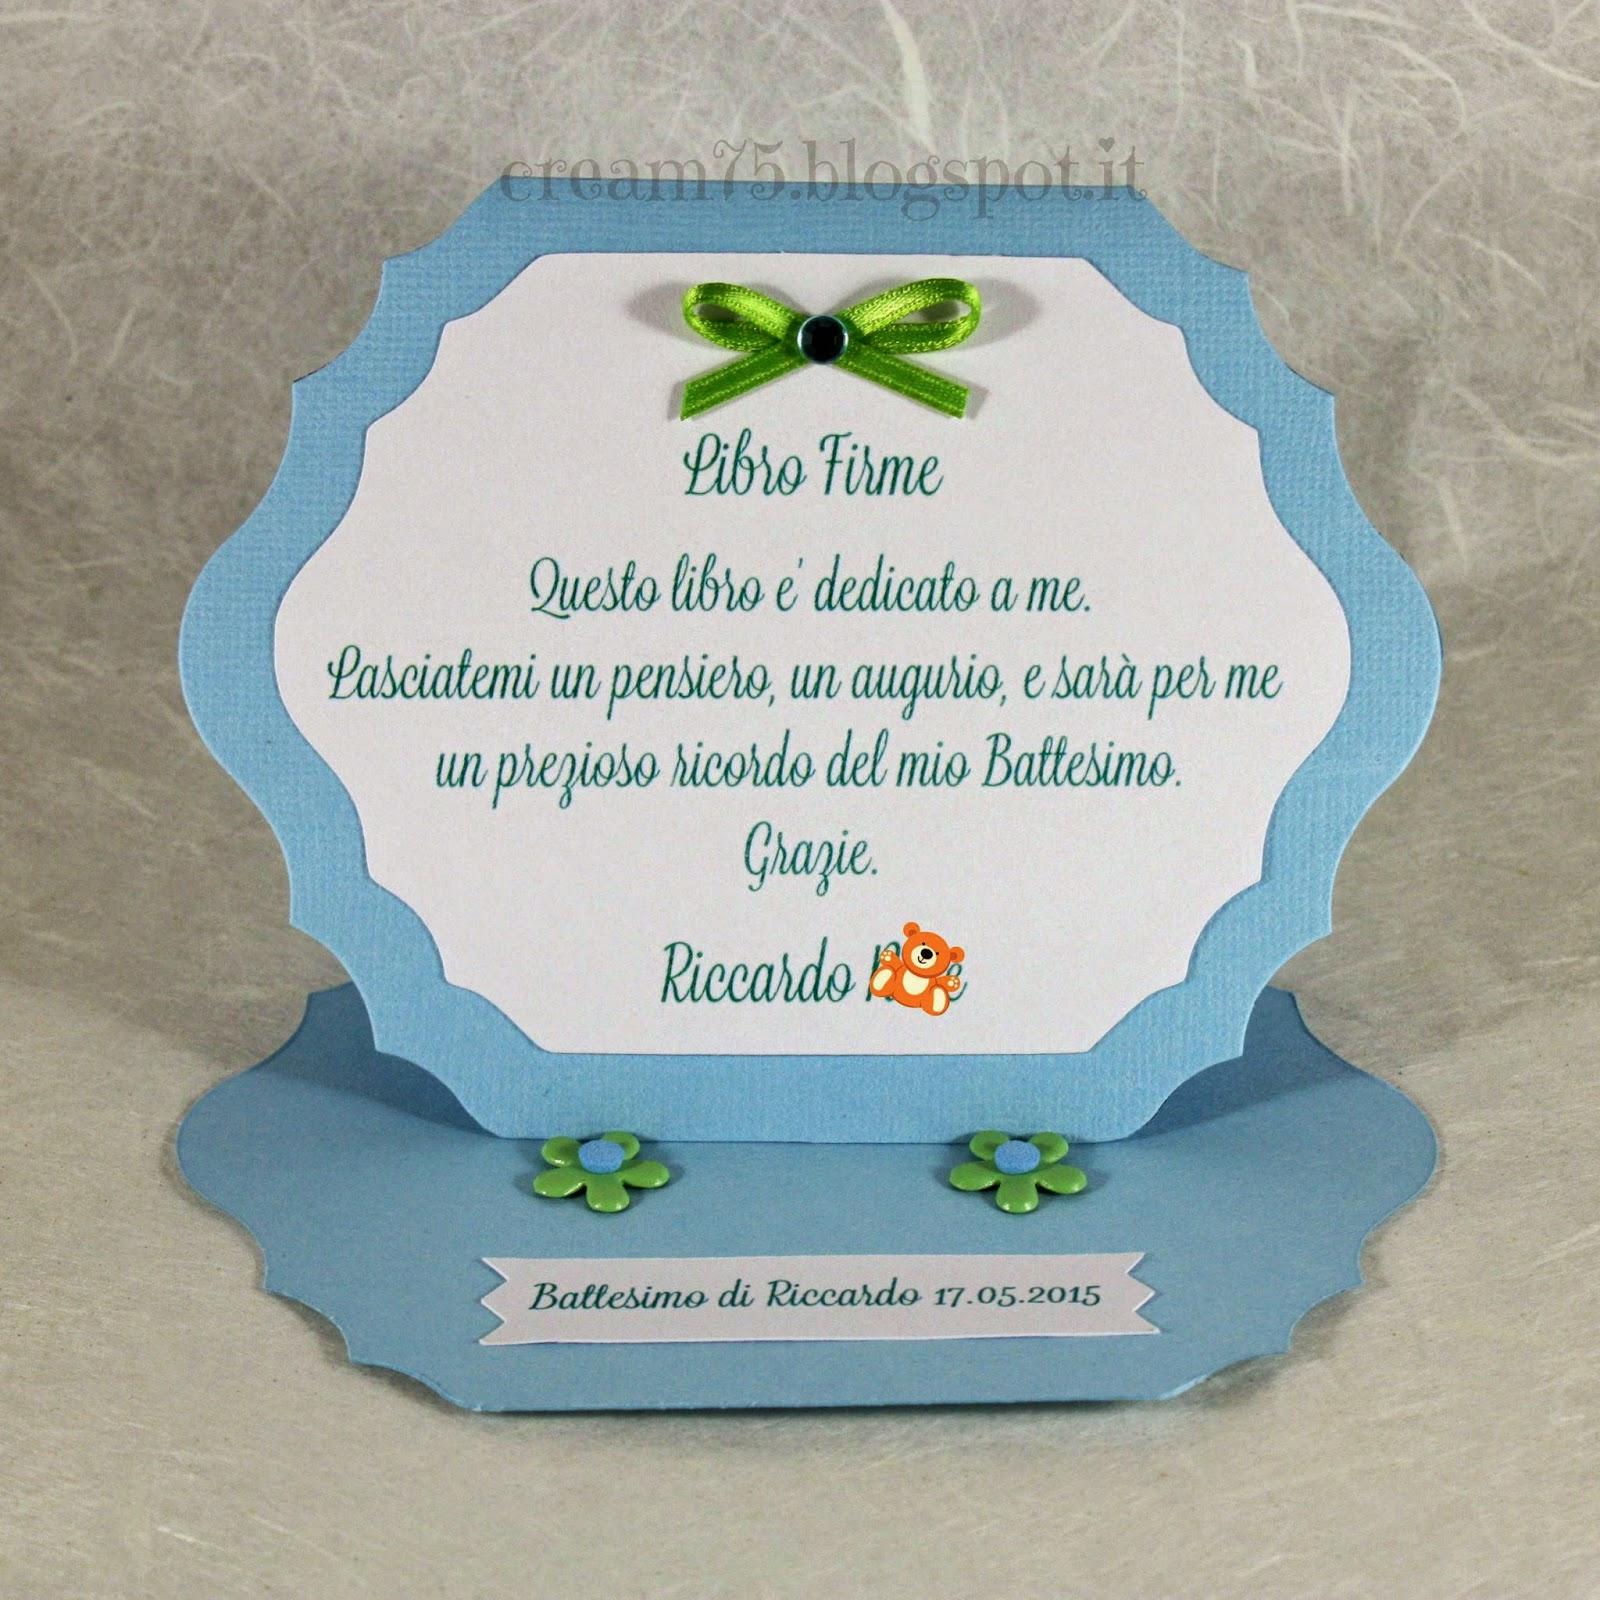 Bien-aimé My Sweet Blog: Biglietto abbinato al guestbook Battesimo NK65